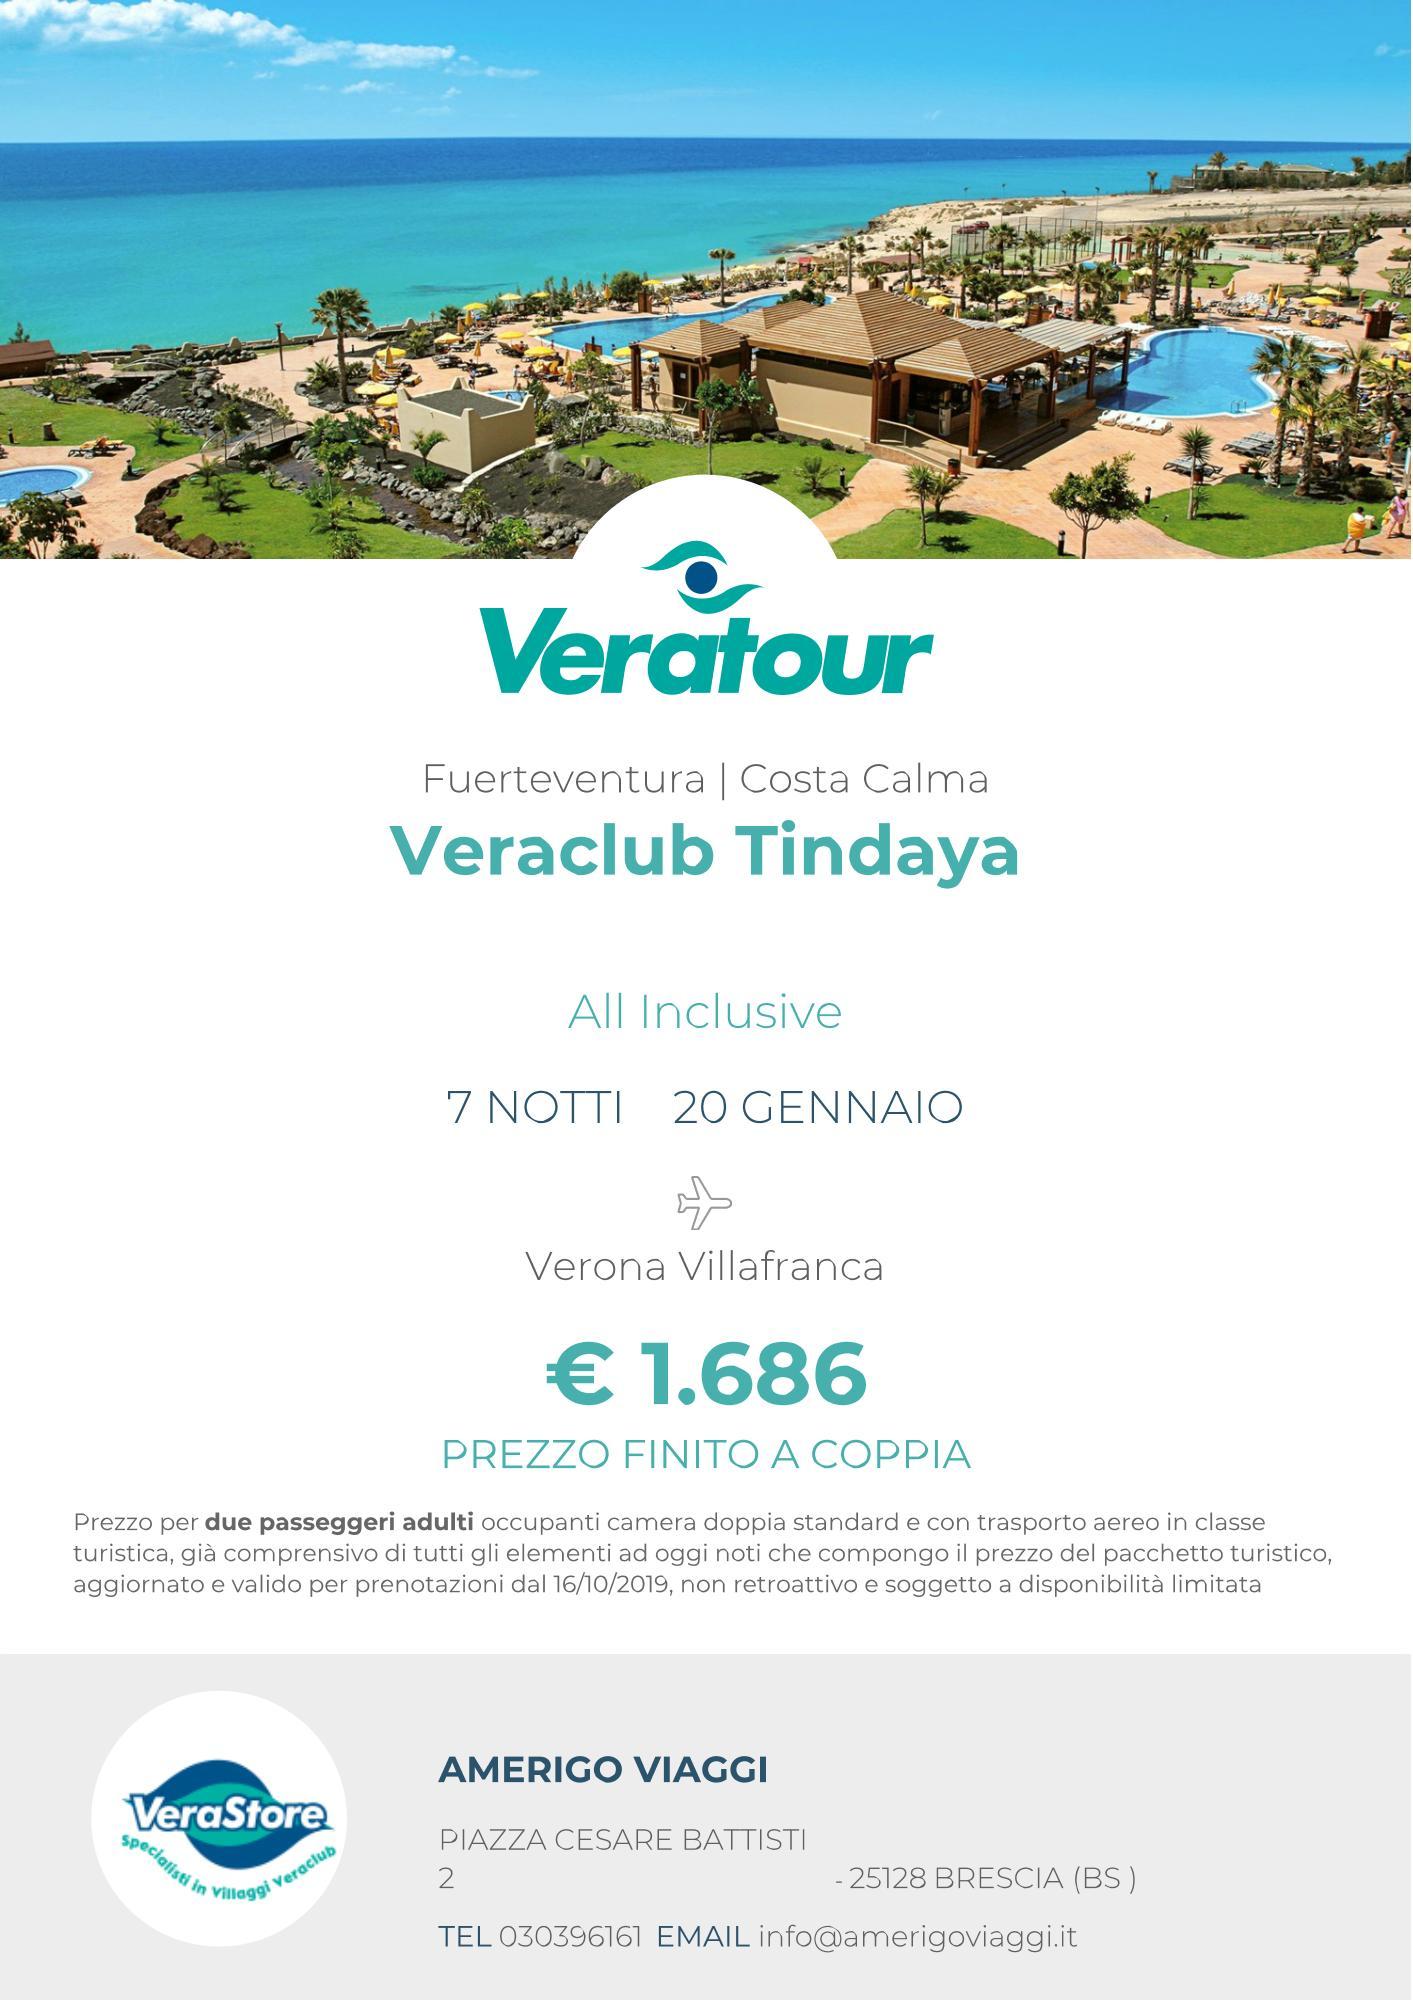 box_Veraclub Tindaya_page_1